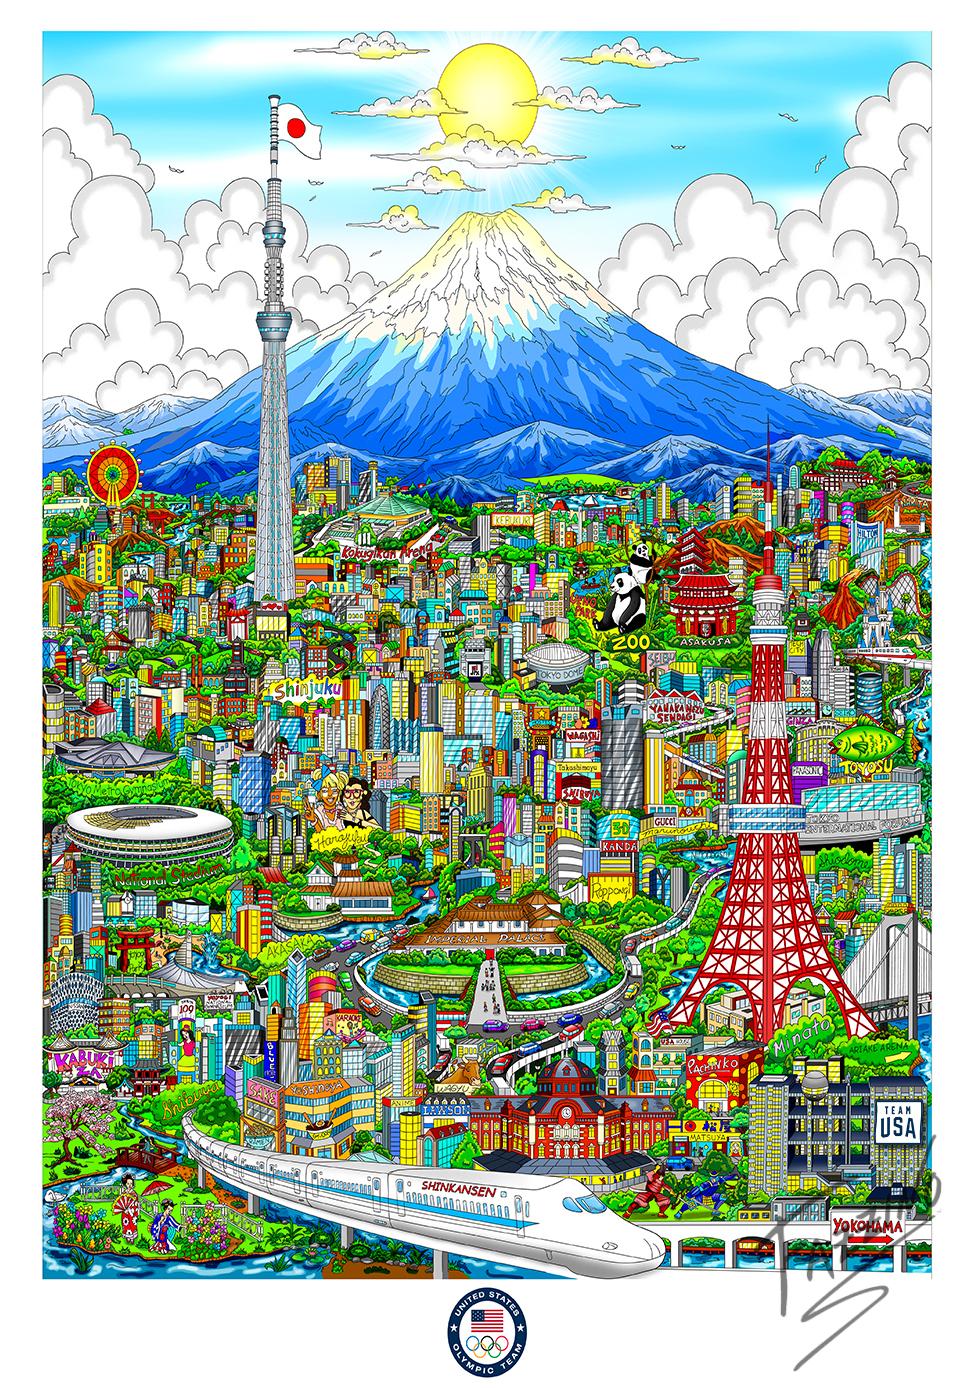 Olympic Games Tokyo 2020 - Charles Fazzino pop artwork of Olympic Games, Team USA, Mt Fuji Volcano and Shinkansen (Japanese Bullet Train)